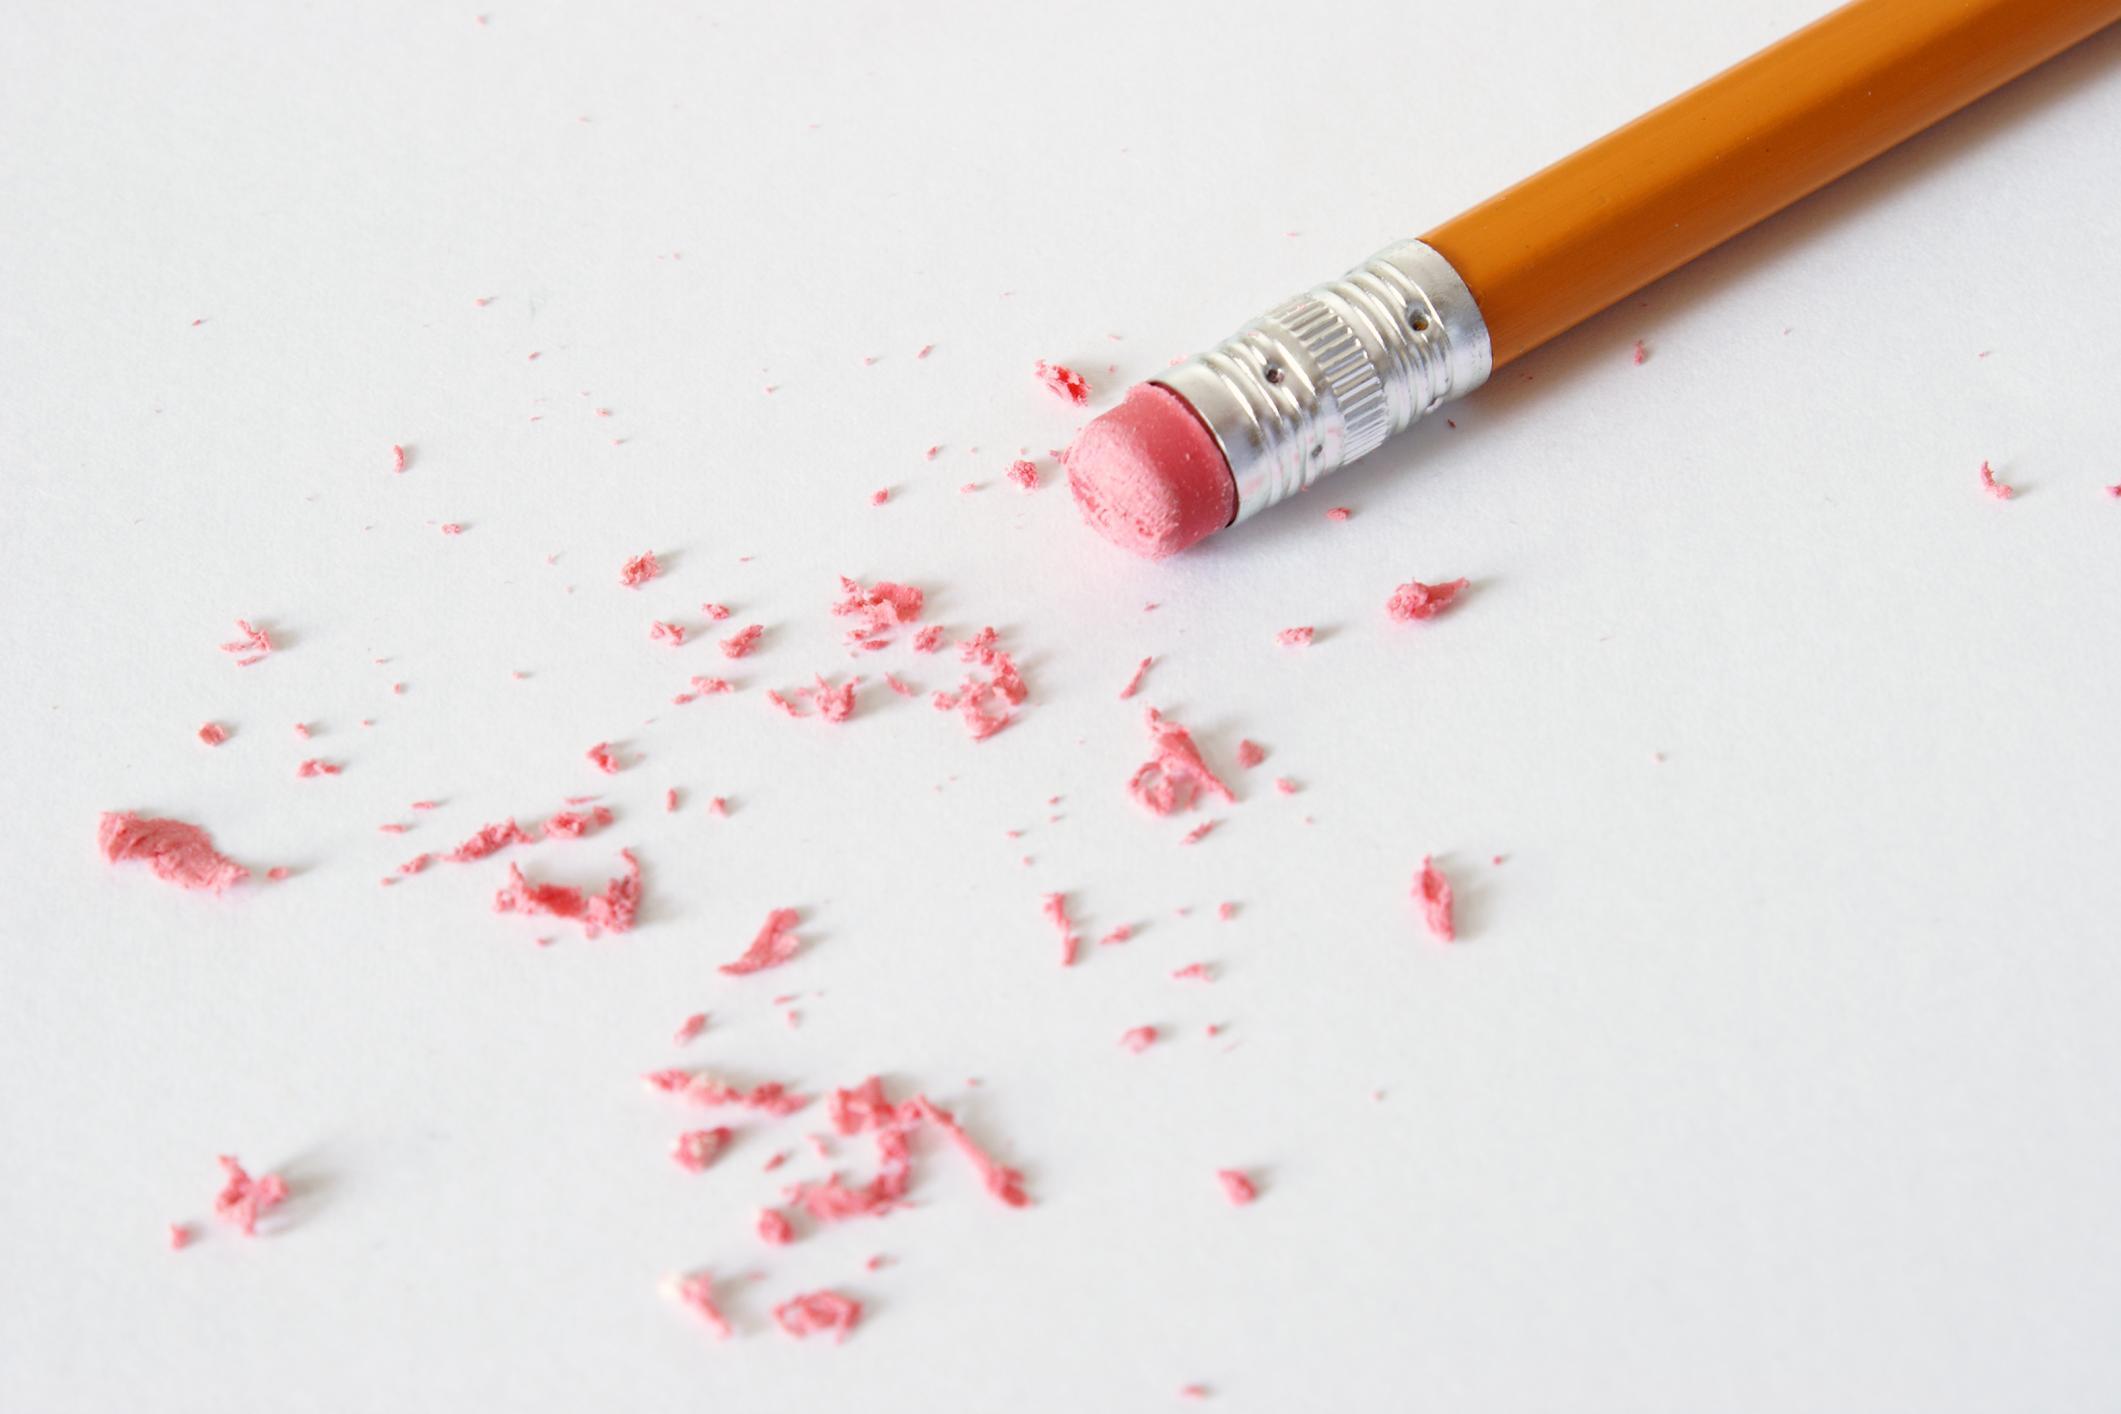 kneaded eraser